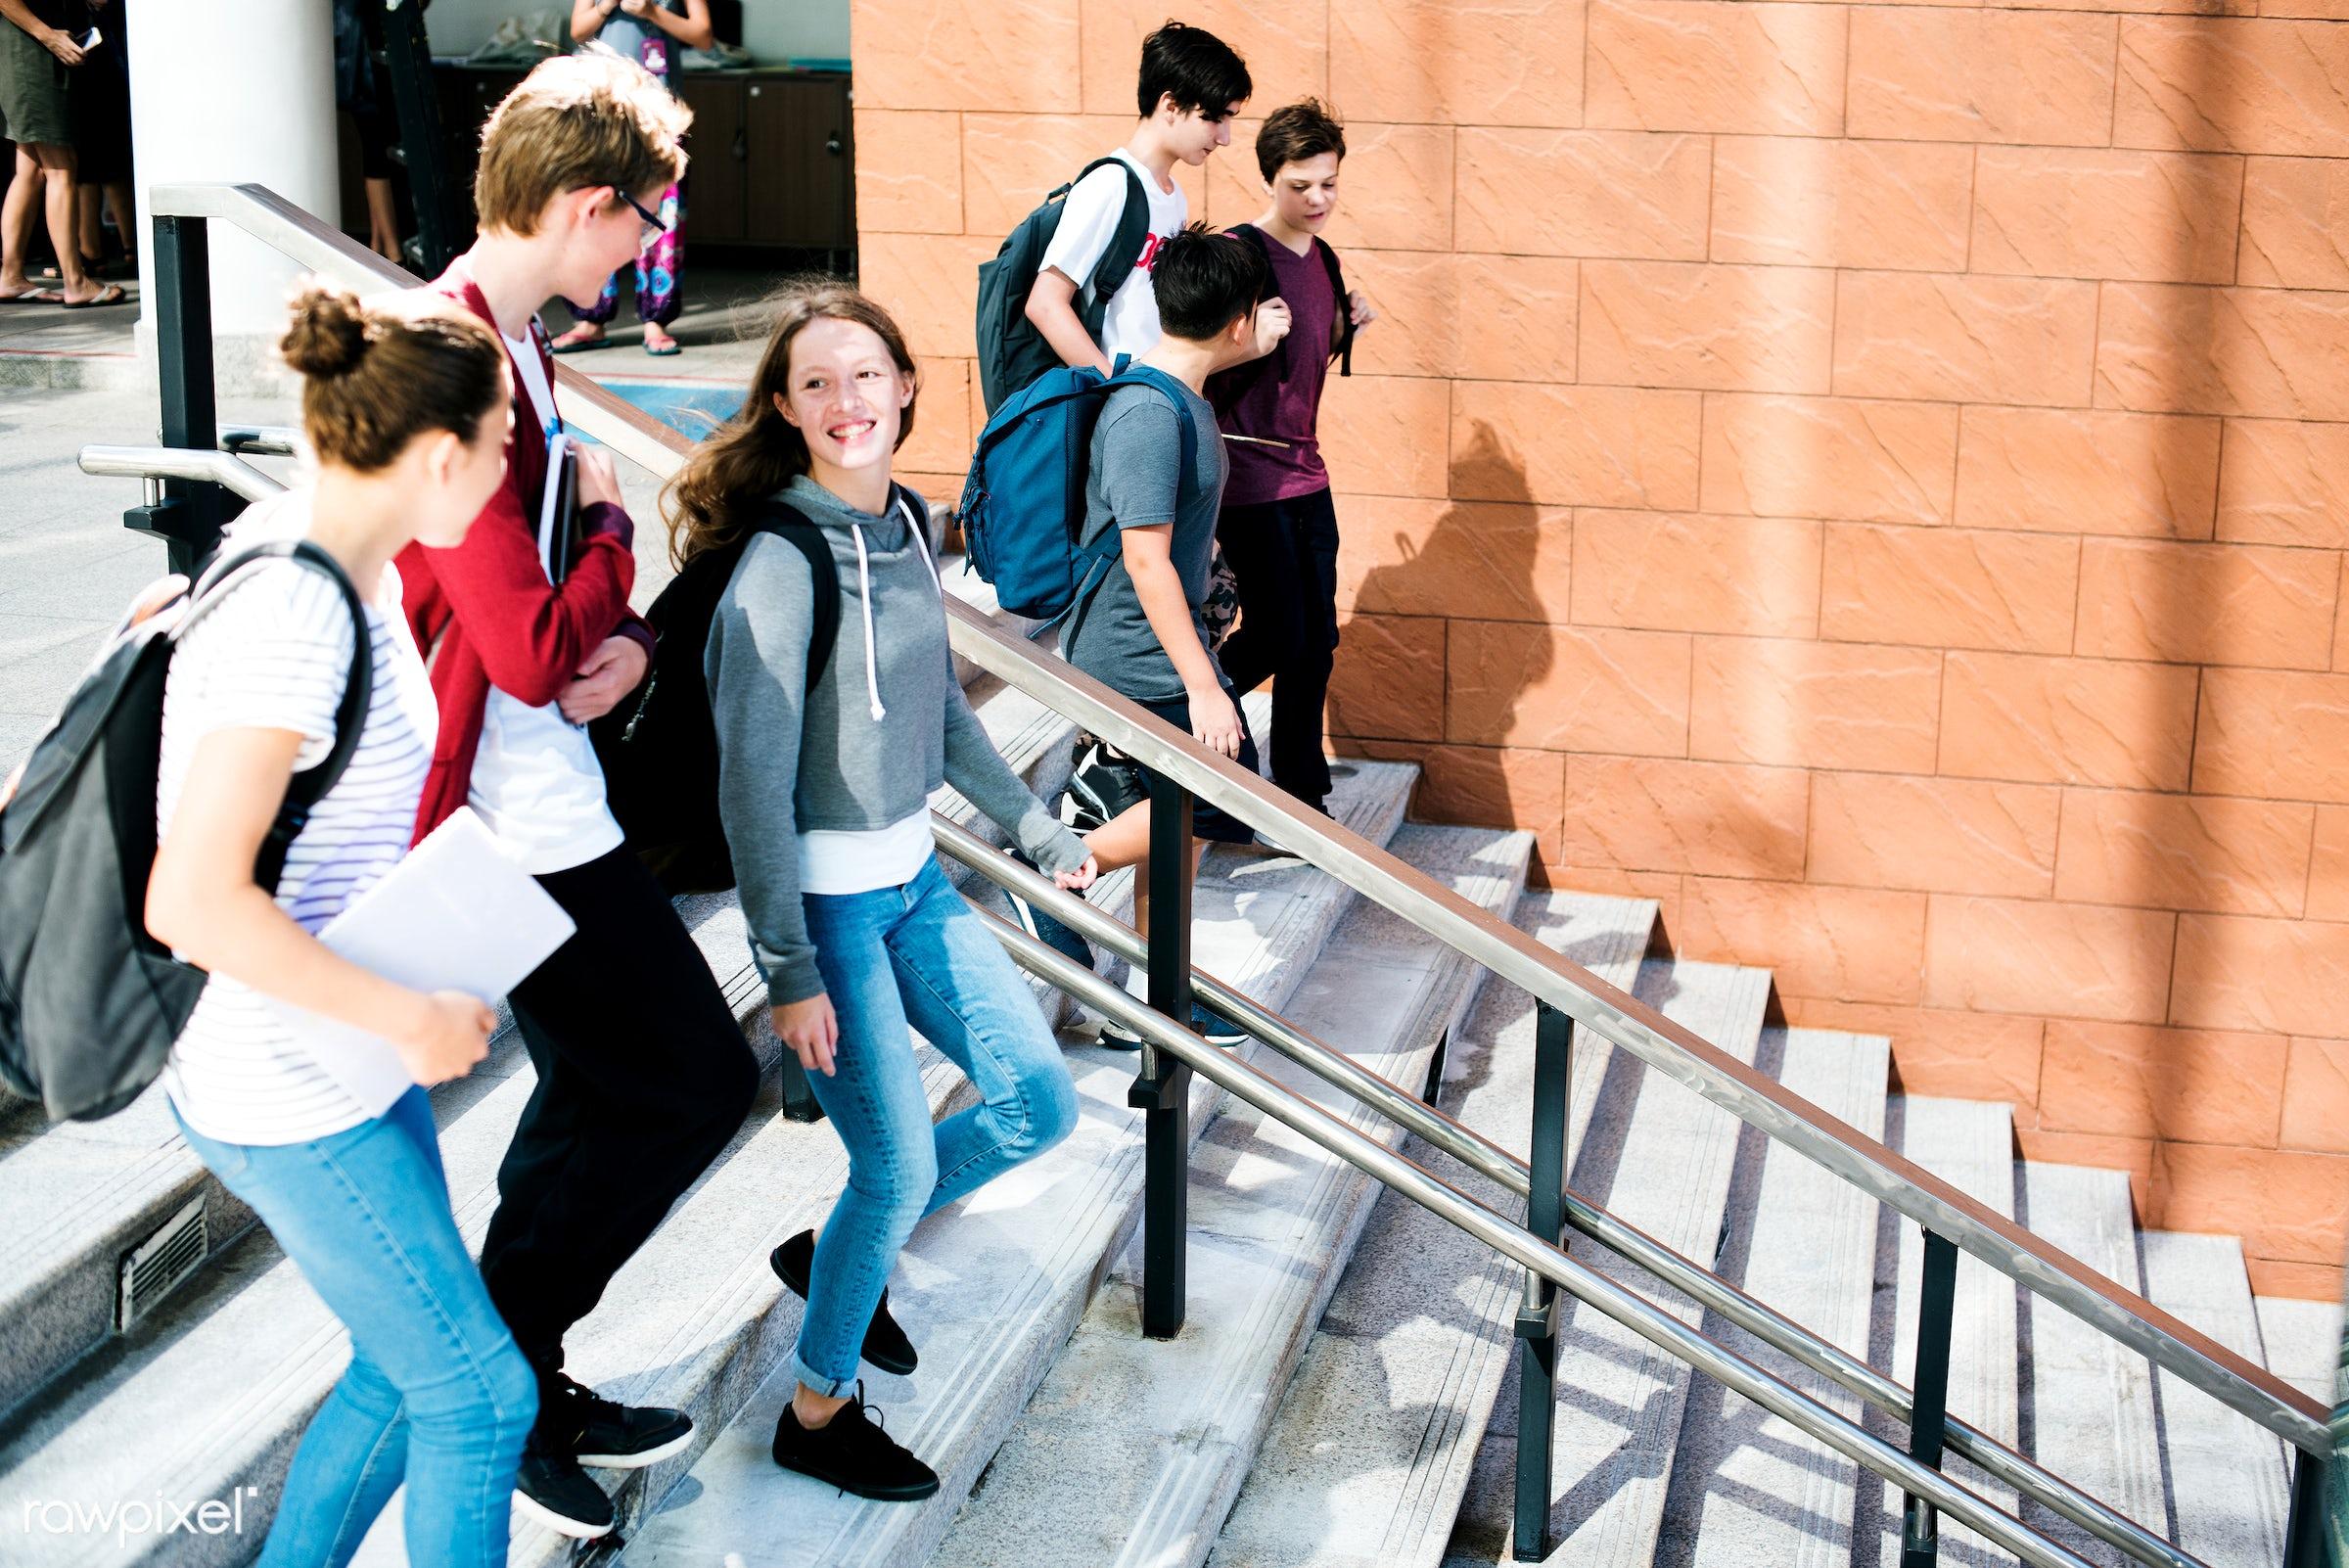 walking, education, people, positivity, together, caucasian, teenage, friends, boys, lifestyle, friendship, backpack, men,...